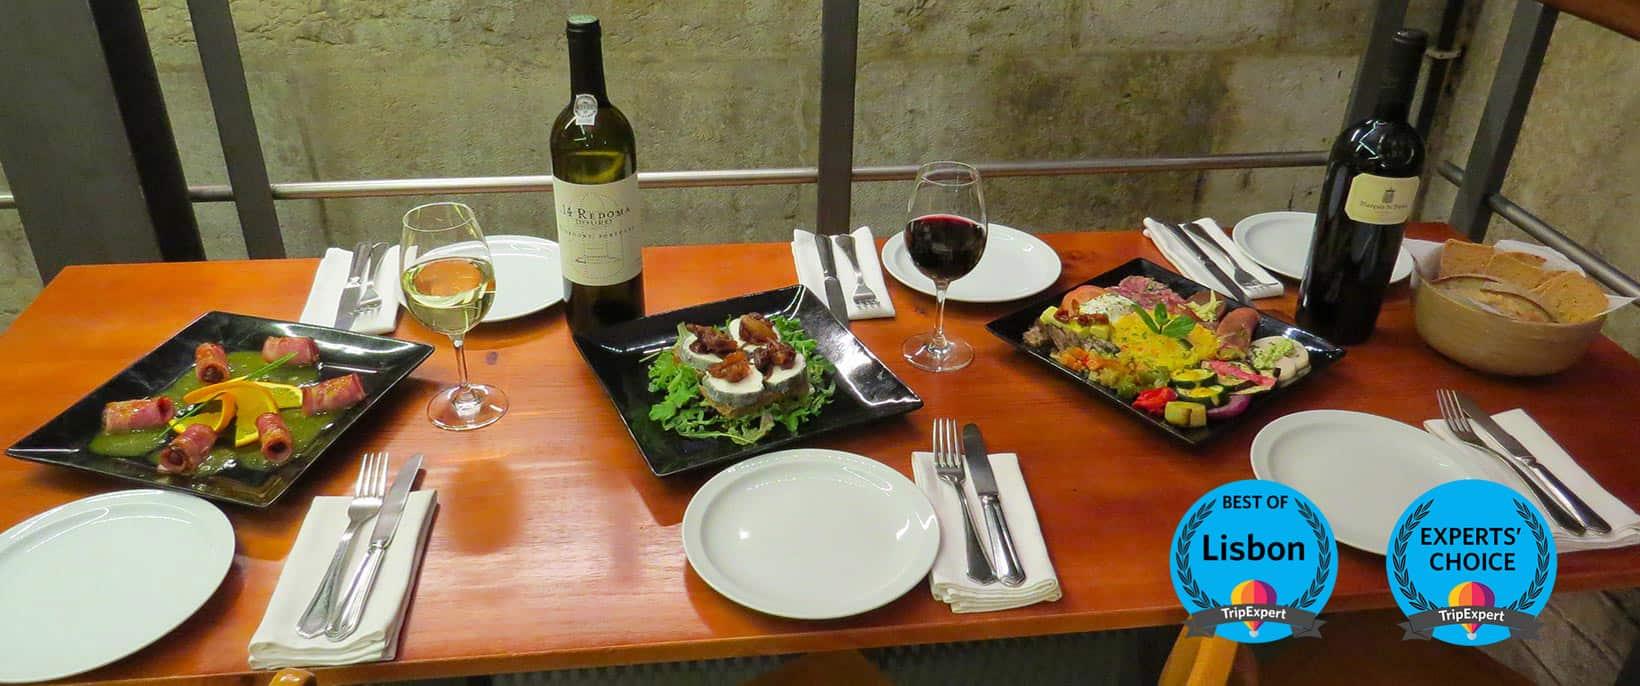 Meilleur restaurant Lisbonne: Chafariz do Vinho